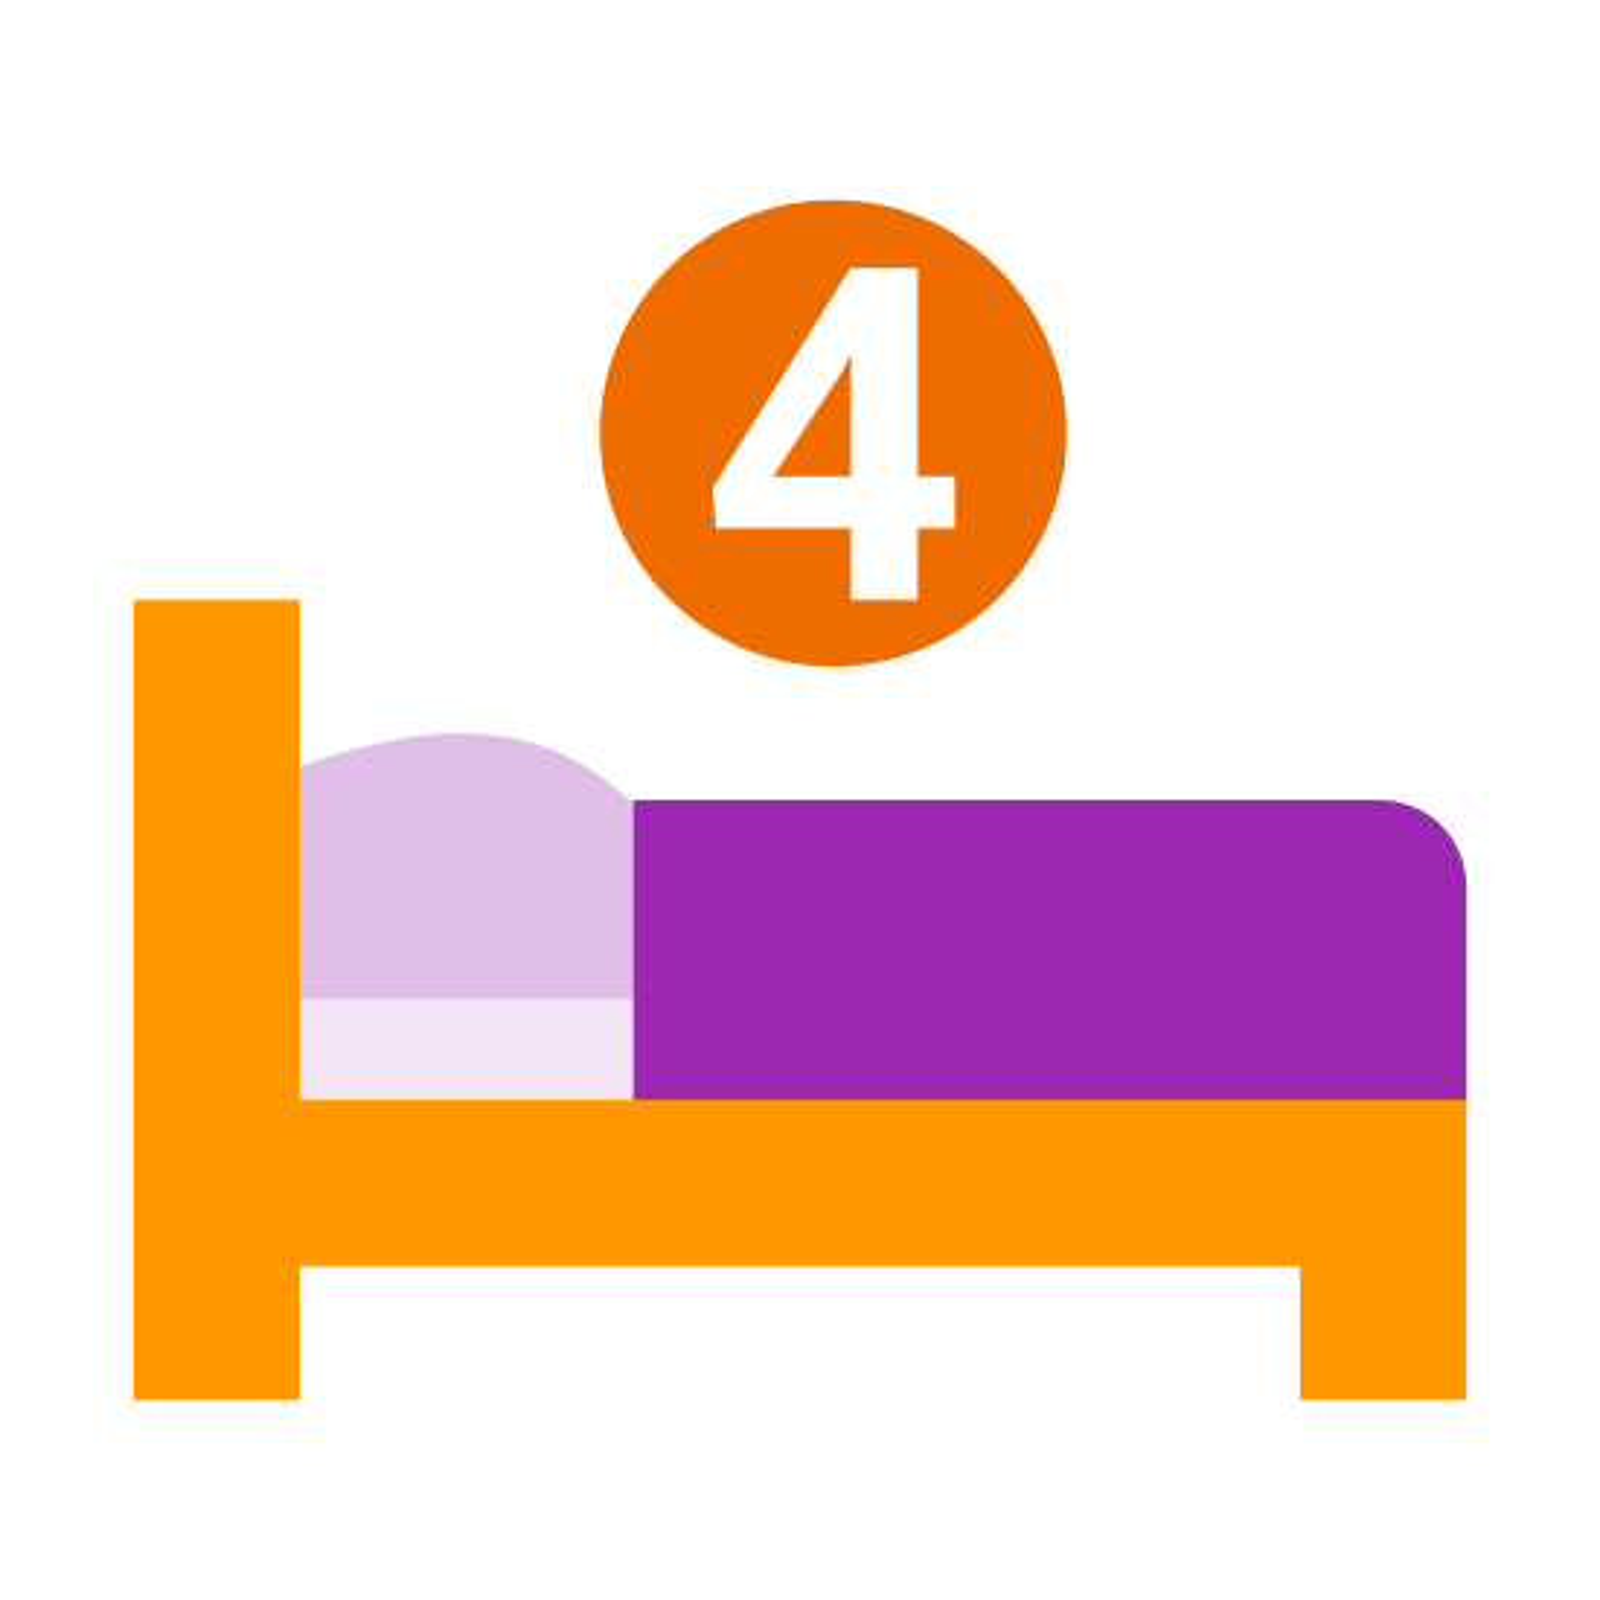 四张床 icon. The four bed symbol is a bed, but on the top of the bed there will be a number 4. The bed has a headboard and footboard and a mattress on top of it. The bed will also be shown with a pillow and blanket, but there are not 4 different beds.